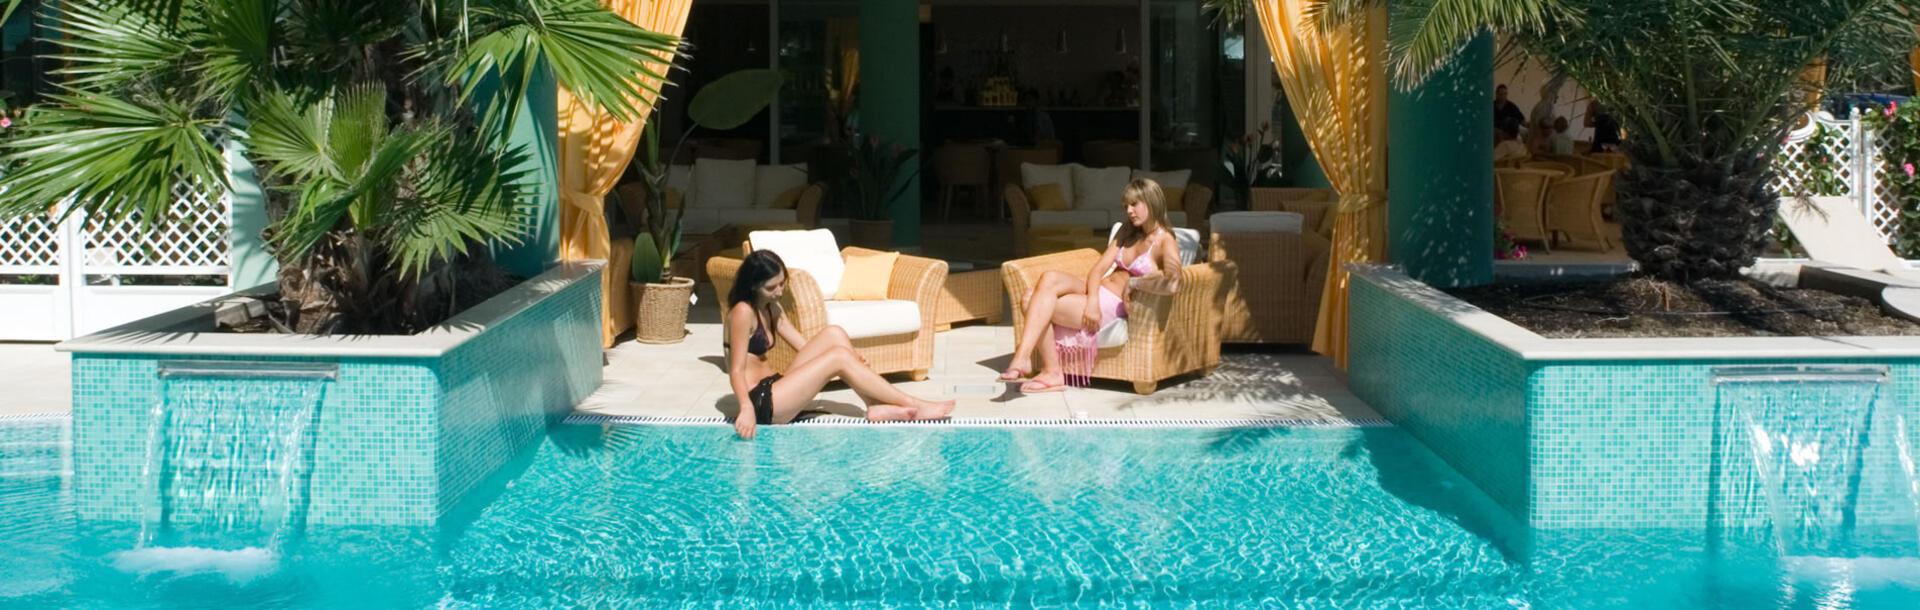 hotel-montecarlo it socialgallery 013